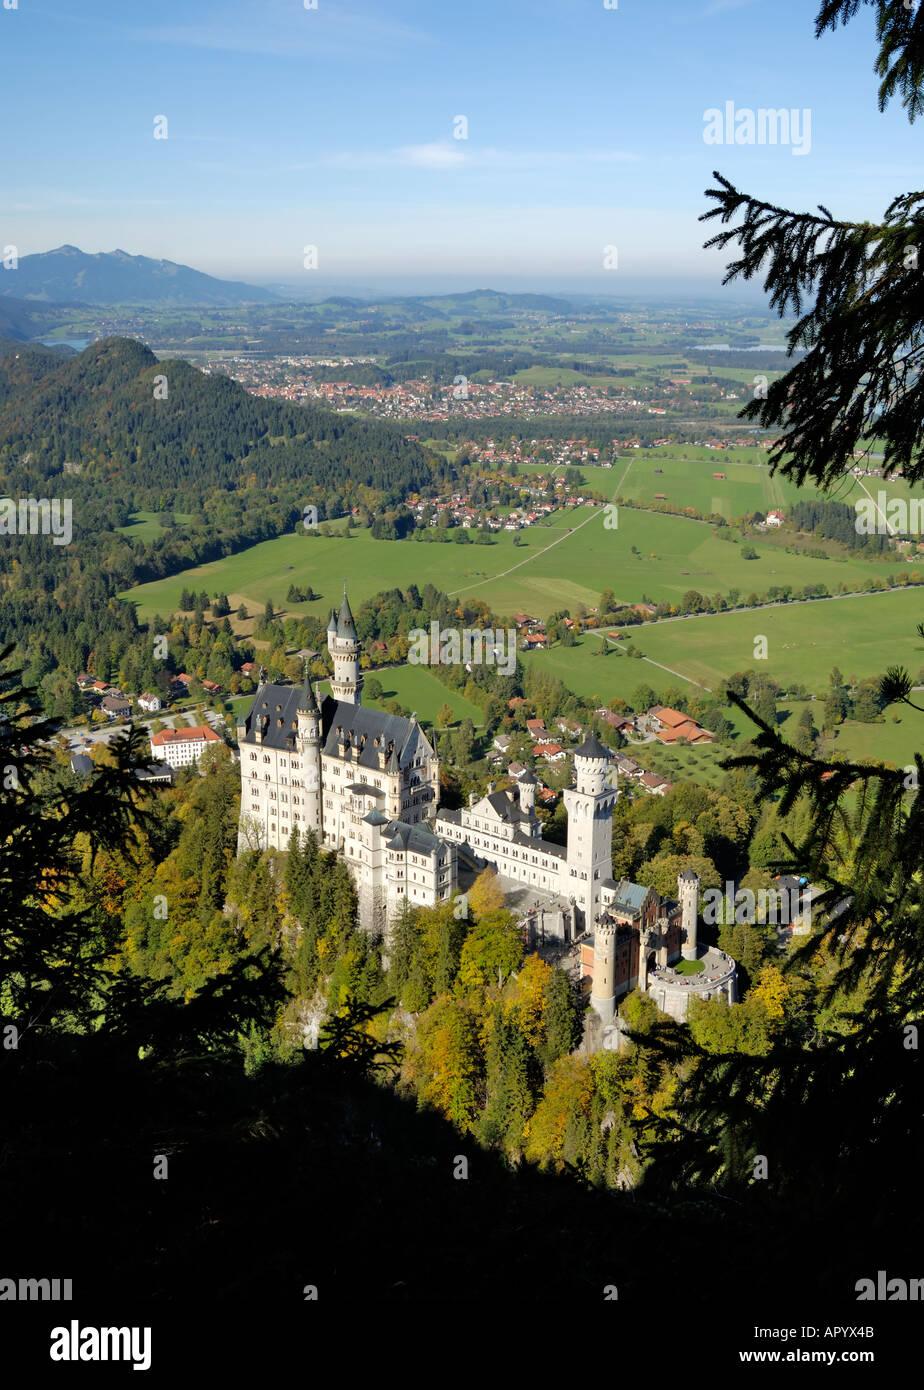 Schloss Neuschwanstein, fairytale castle built by King Ludwig II, near Fussen, Bavaria (Bayern), Germany - Stock Image